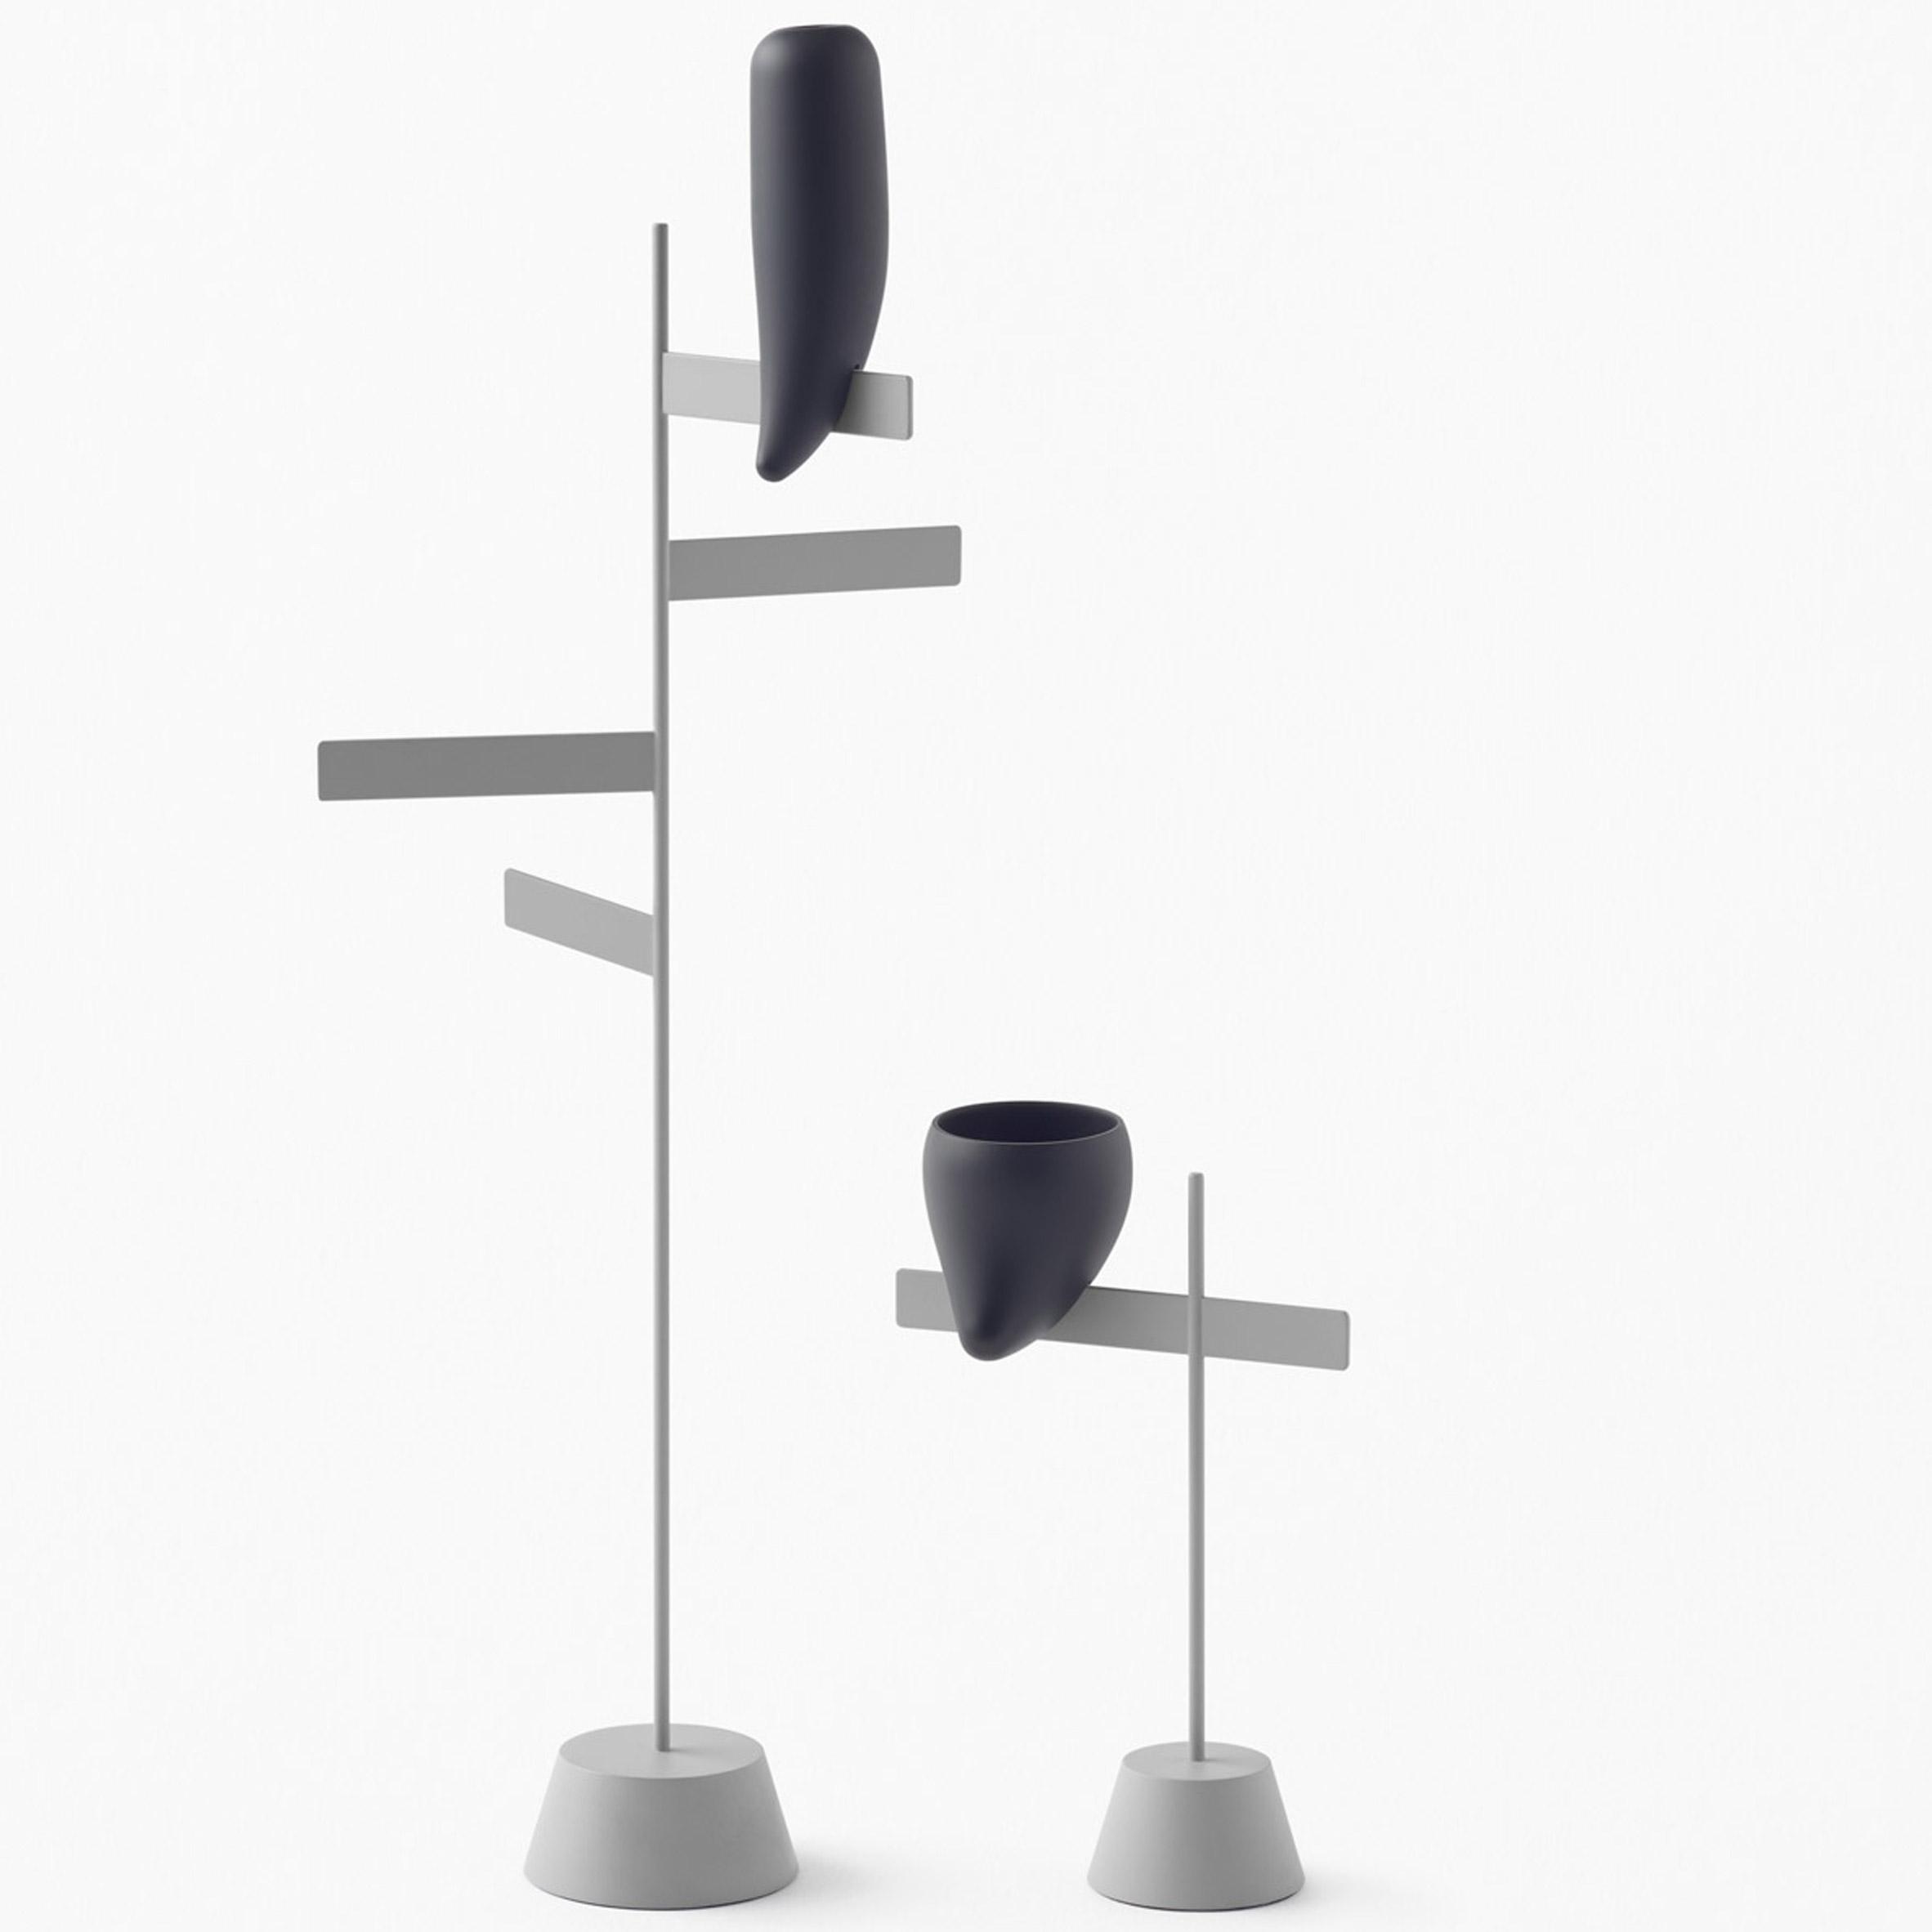 Nendo Creates Kanji Inspired Furniture And Stone Shaped Tableware For Zens